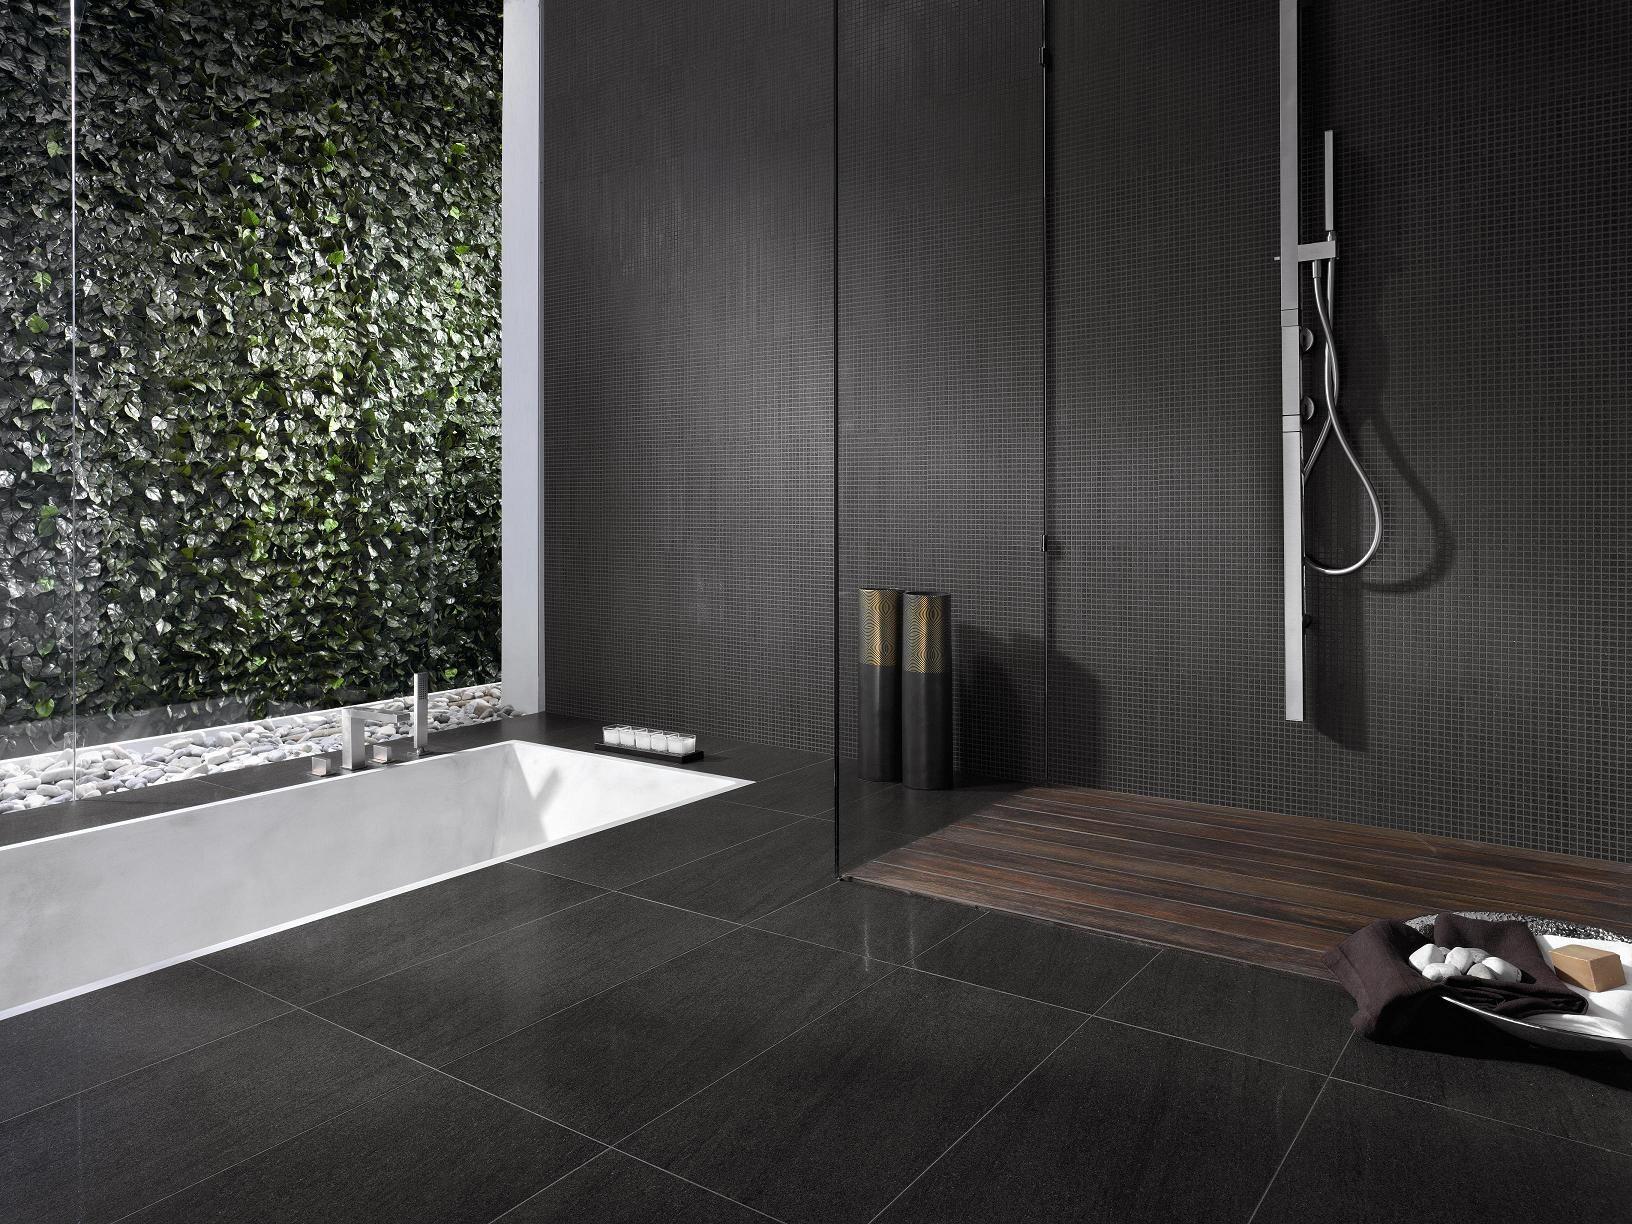 Elegant Modern Japanese Style Bathroom Design With Wall Mount Stainless Steel Faucet Black Minimalist Bathroom Minimalist Bathroom Design Marble Bathroom Floor